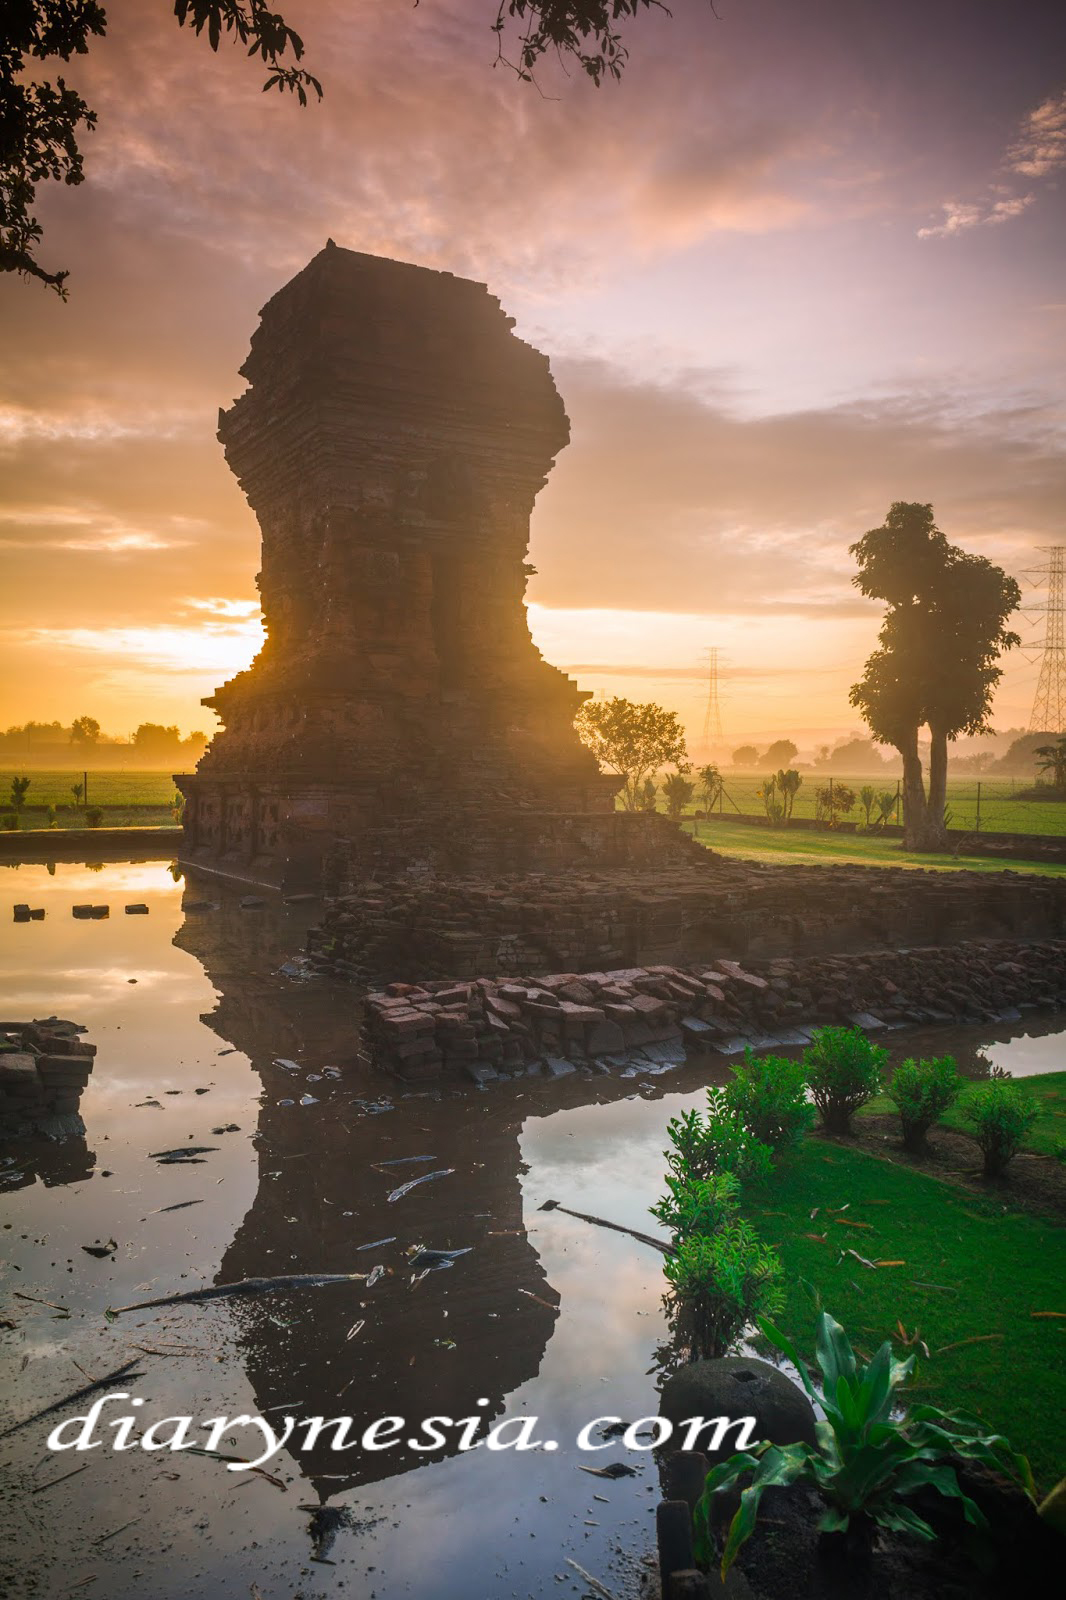 Famous Temples Tourism, East Java Tourism, Majapahit heritage Temples, diarynesia